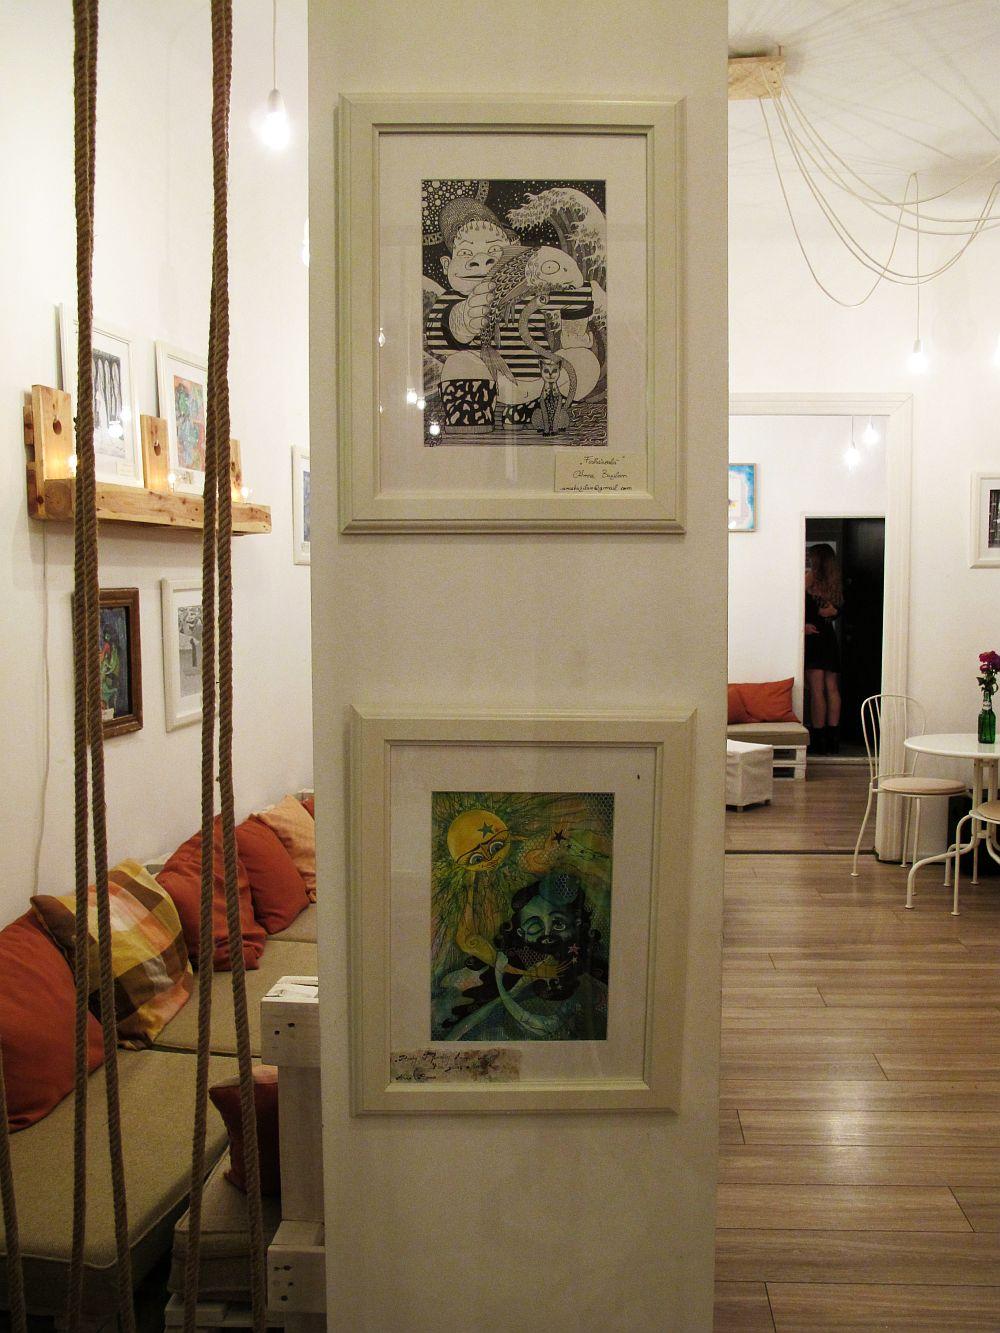 adelaparvu.com despre O povEstetica, expozitie la Pallets, artisti Alina Borcea si Anca Buzilan (1)